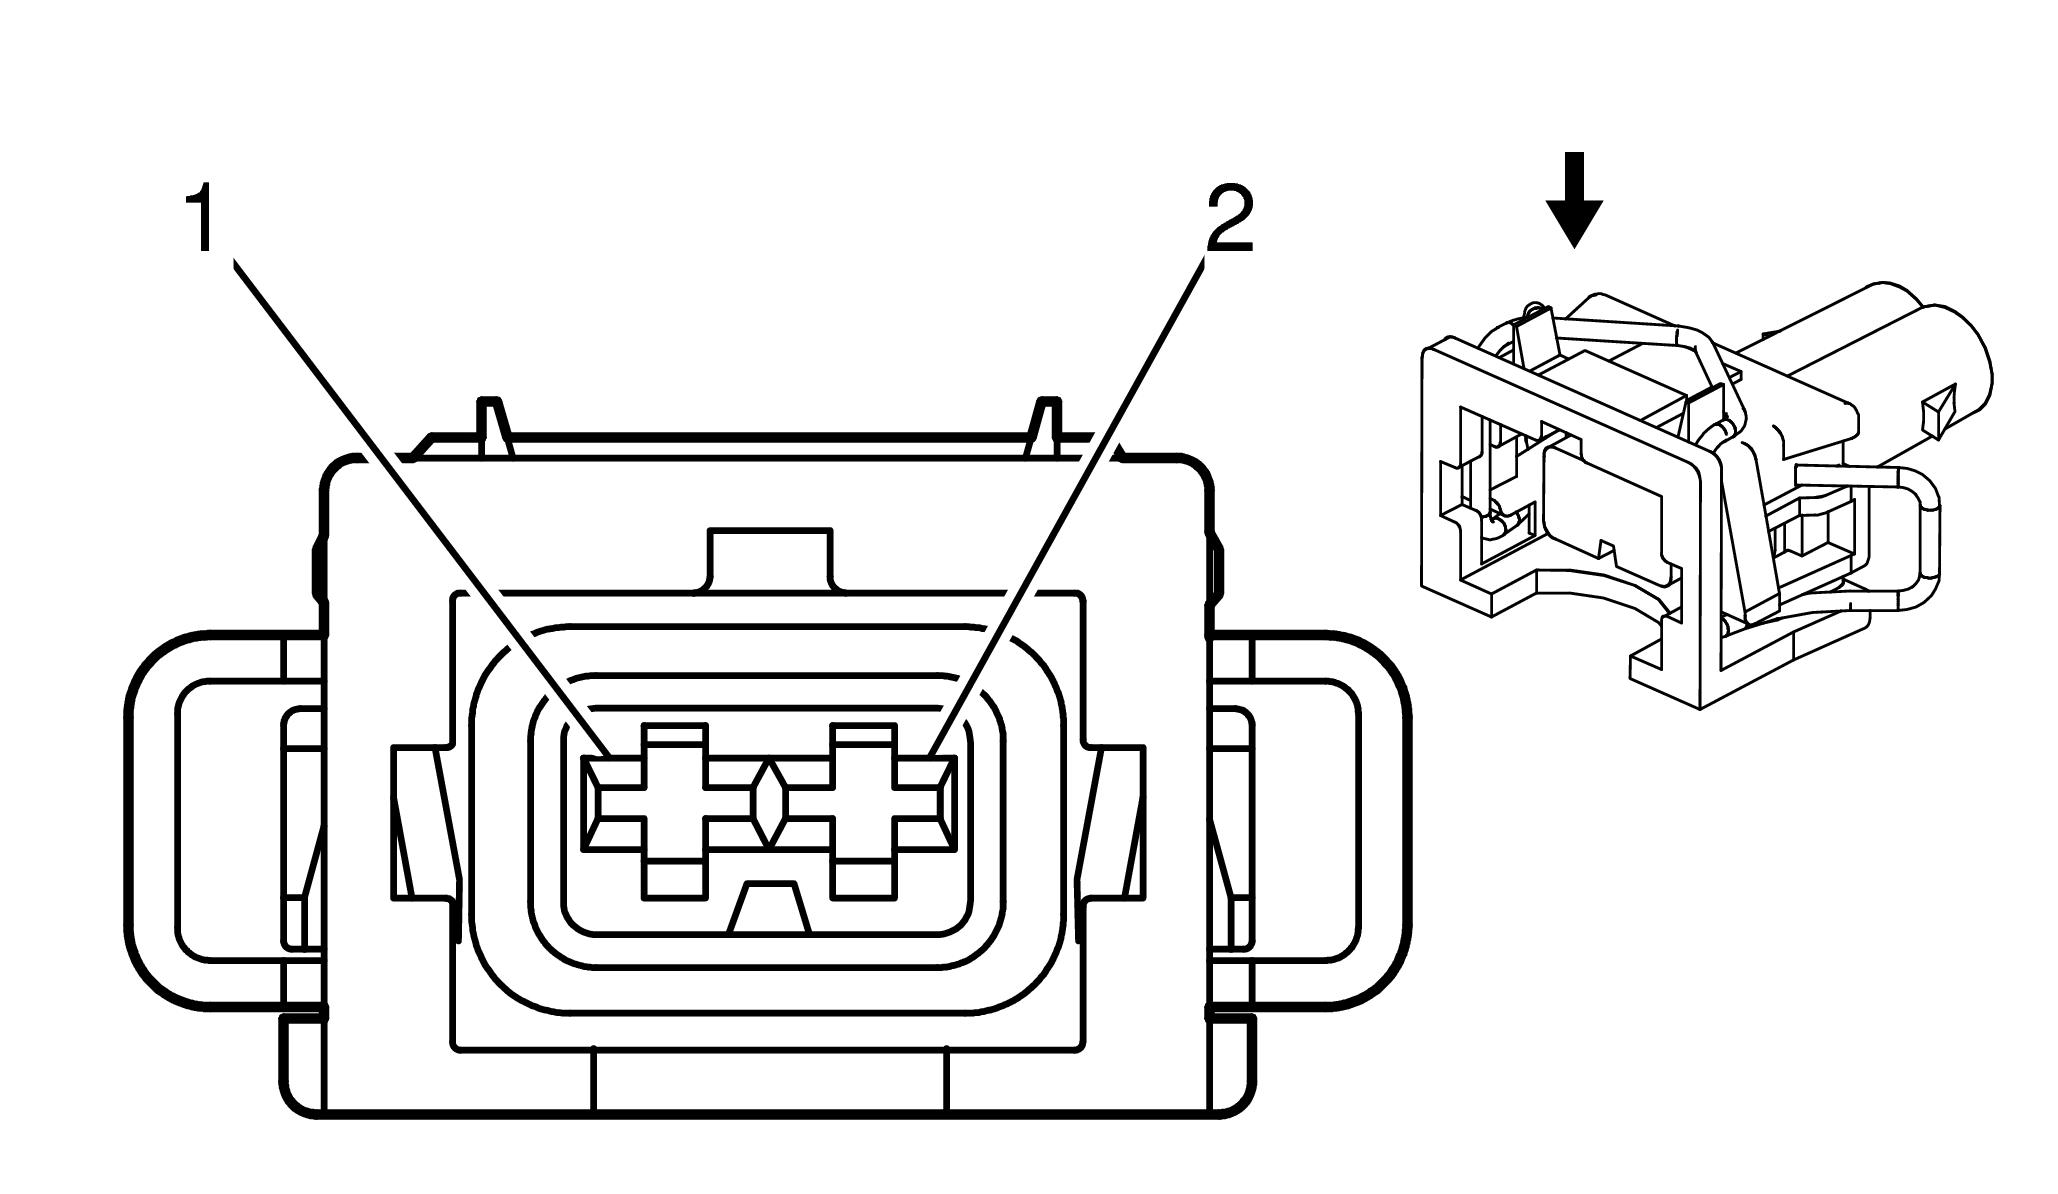 Ford Lightning Intercooler Pump Wiring Diagram : 46 Wiring